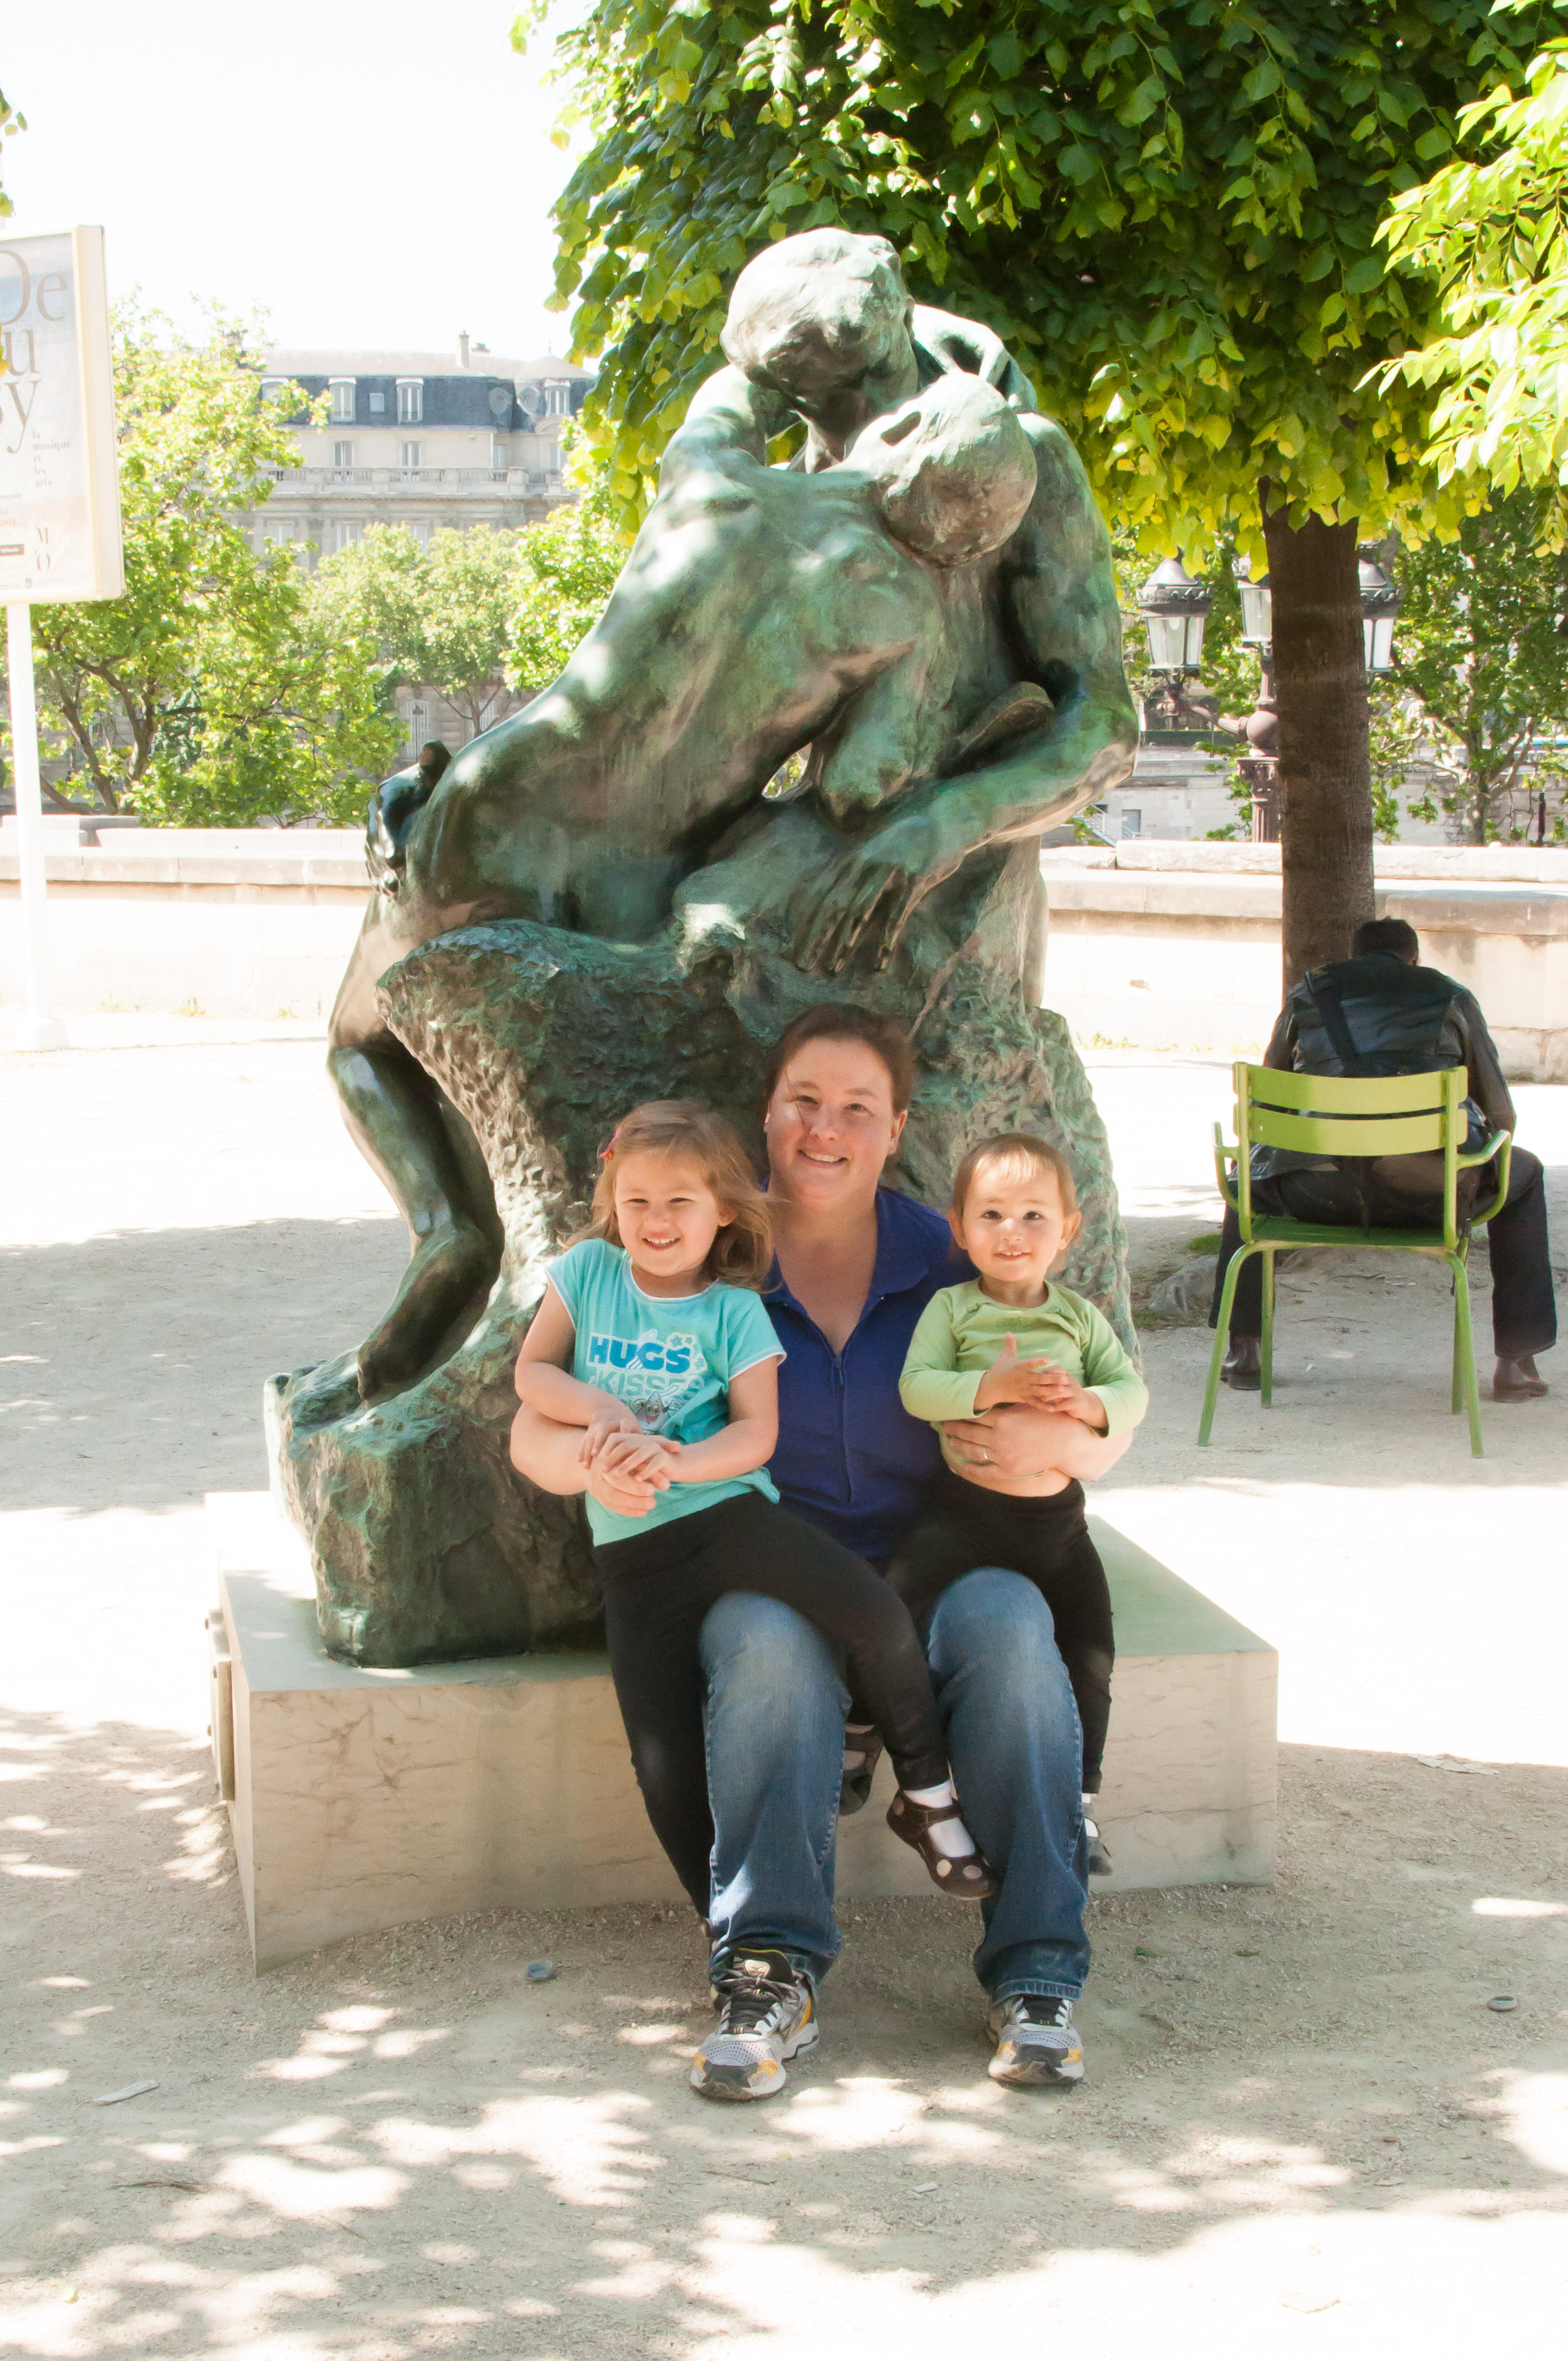 Josie Jen and Celia on the kiss statue